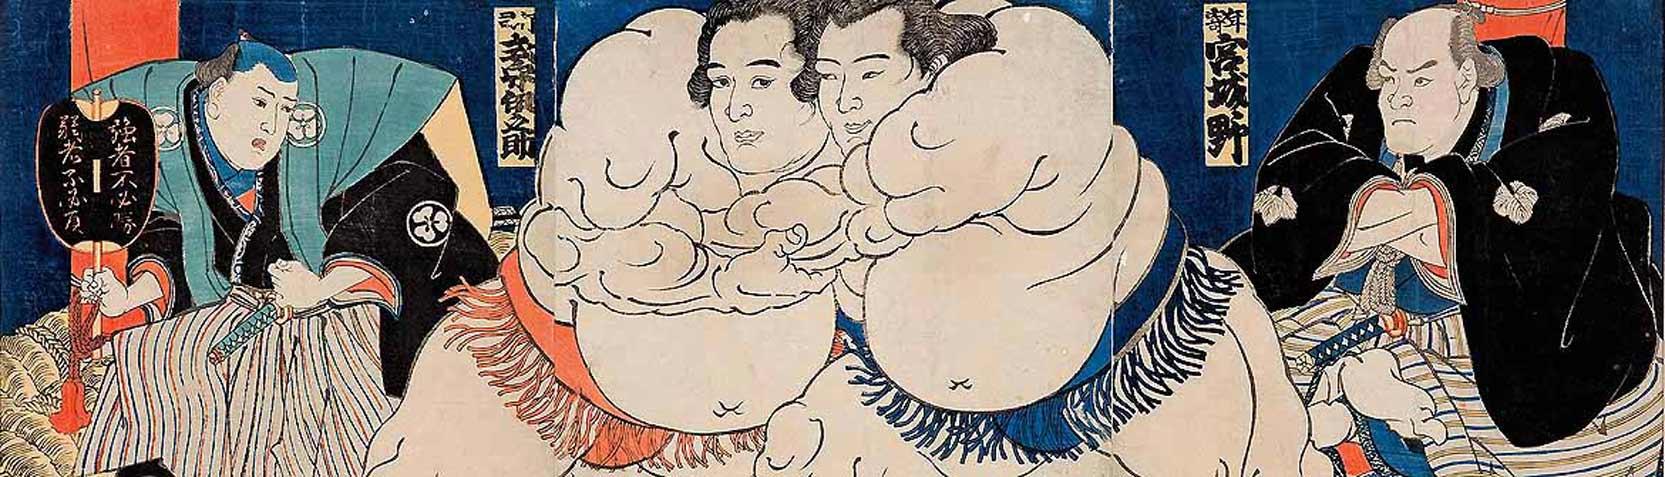 Artyści - Utagawa Kuniyoshi